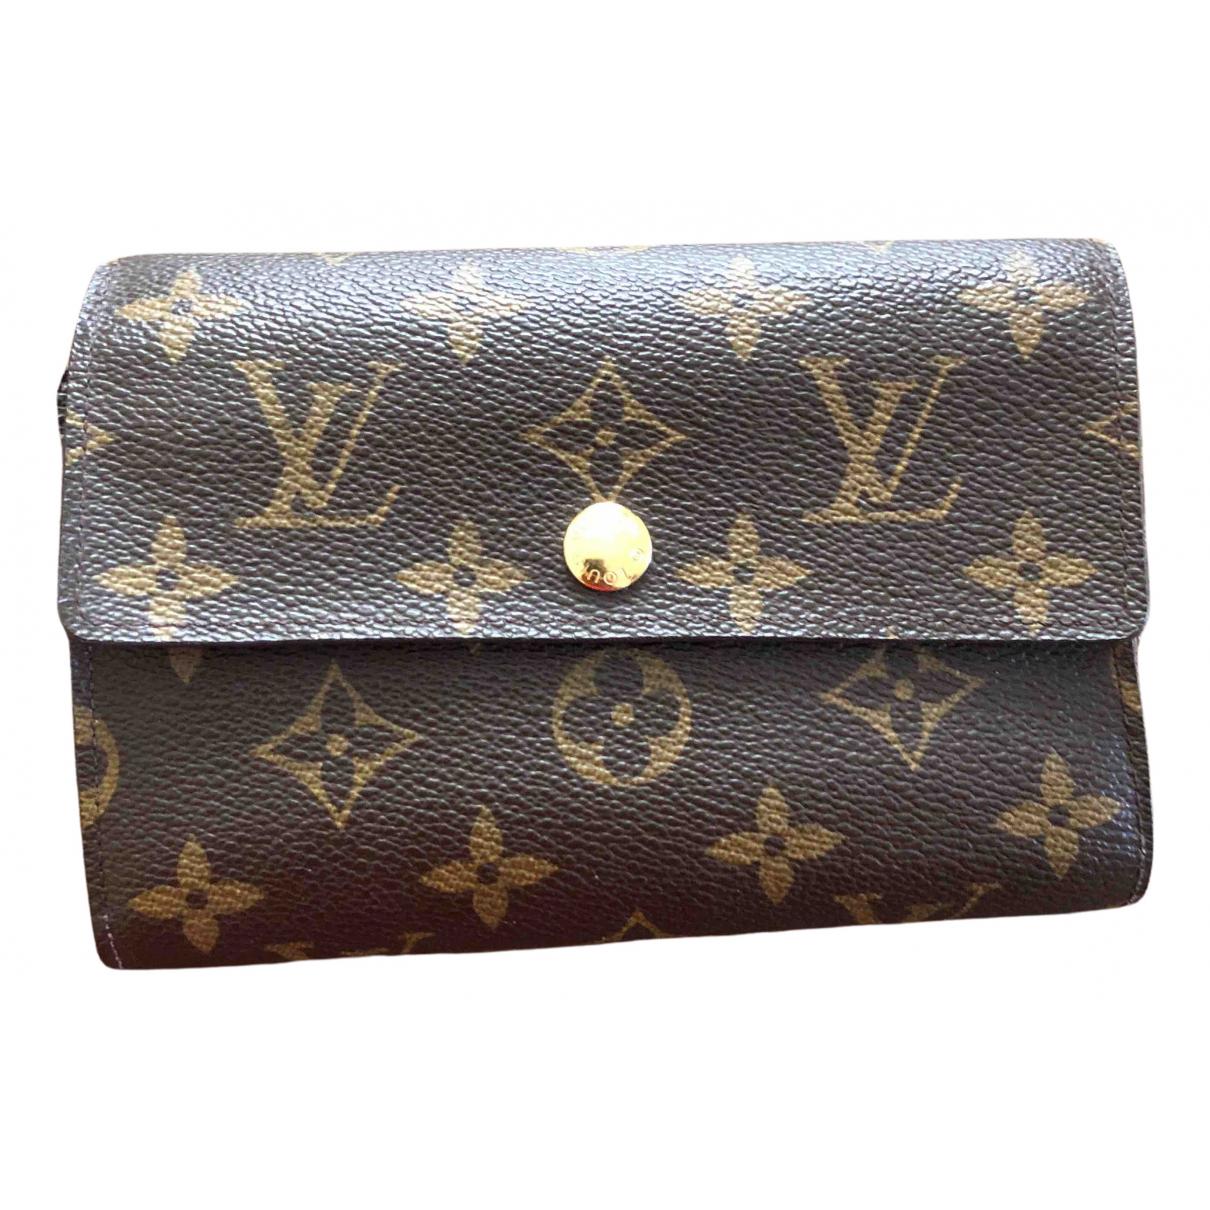 Cartera Virtuose de Lona Louis Vuitton